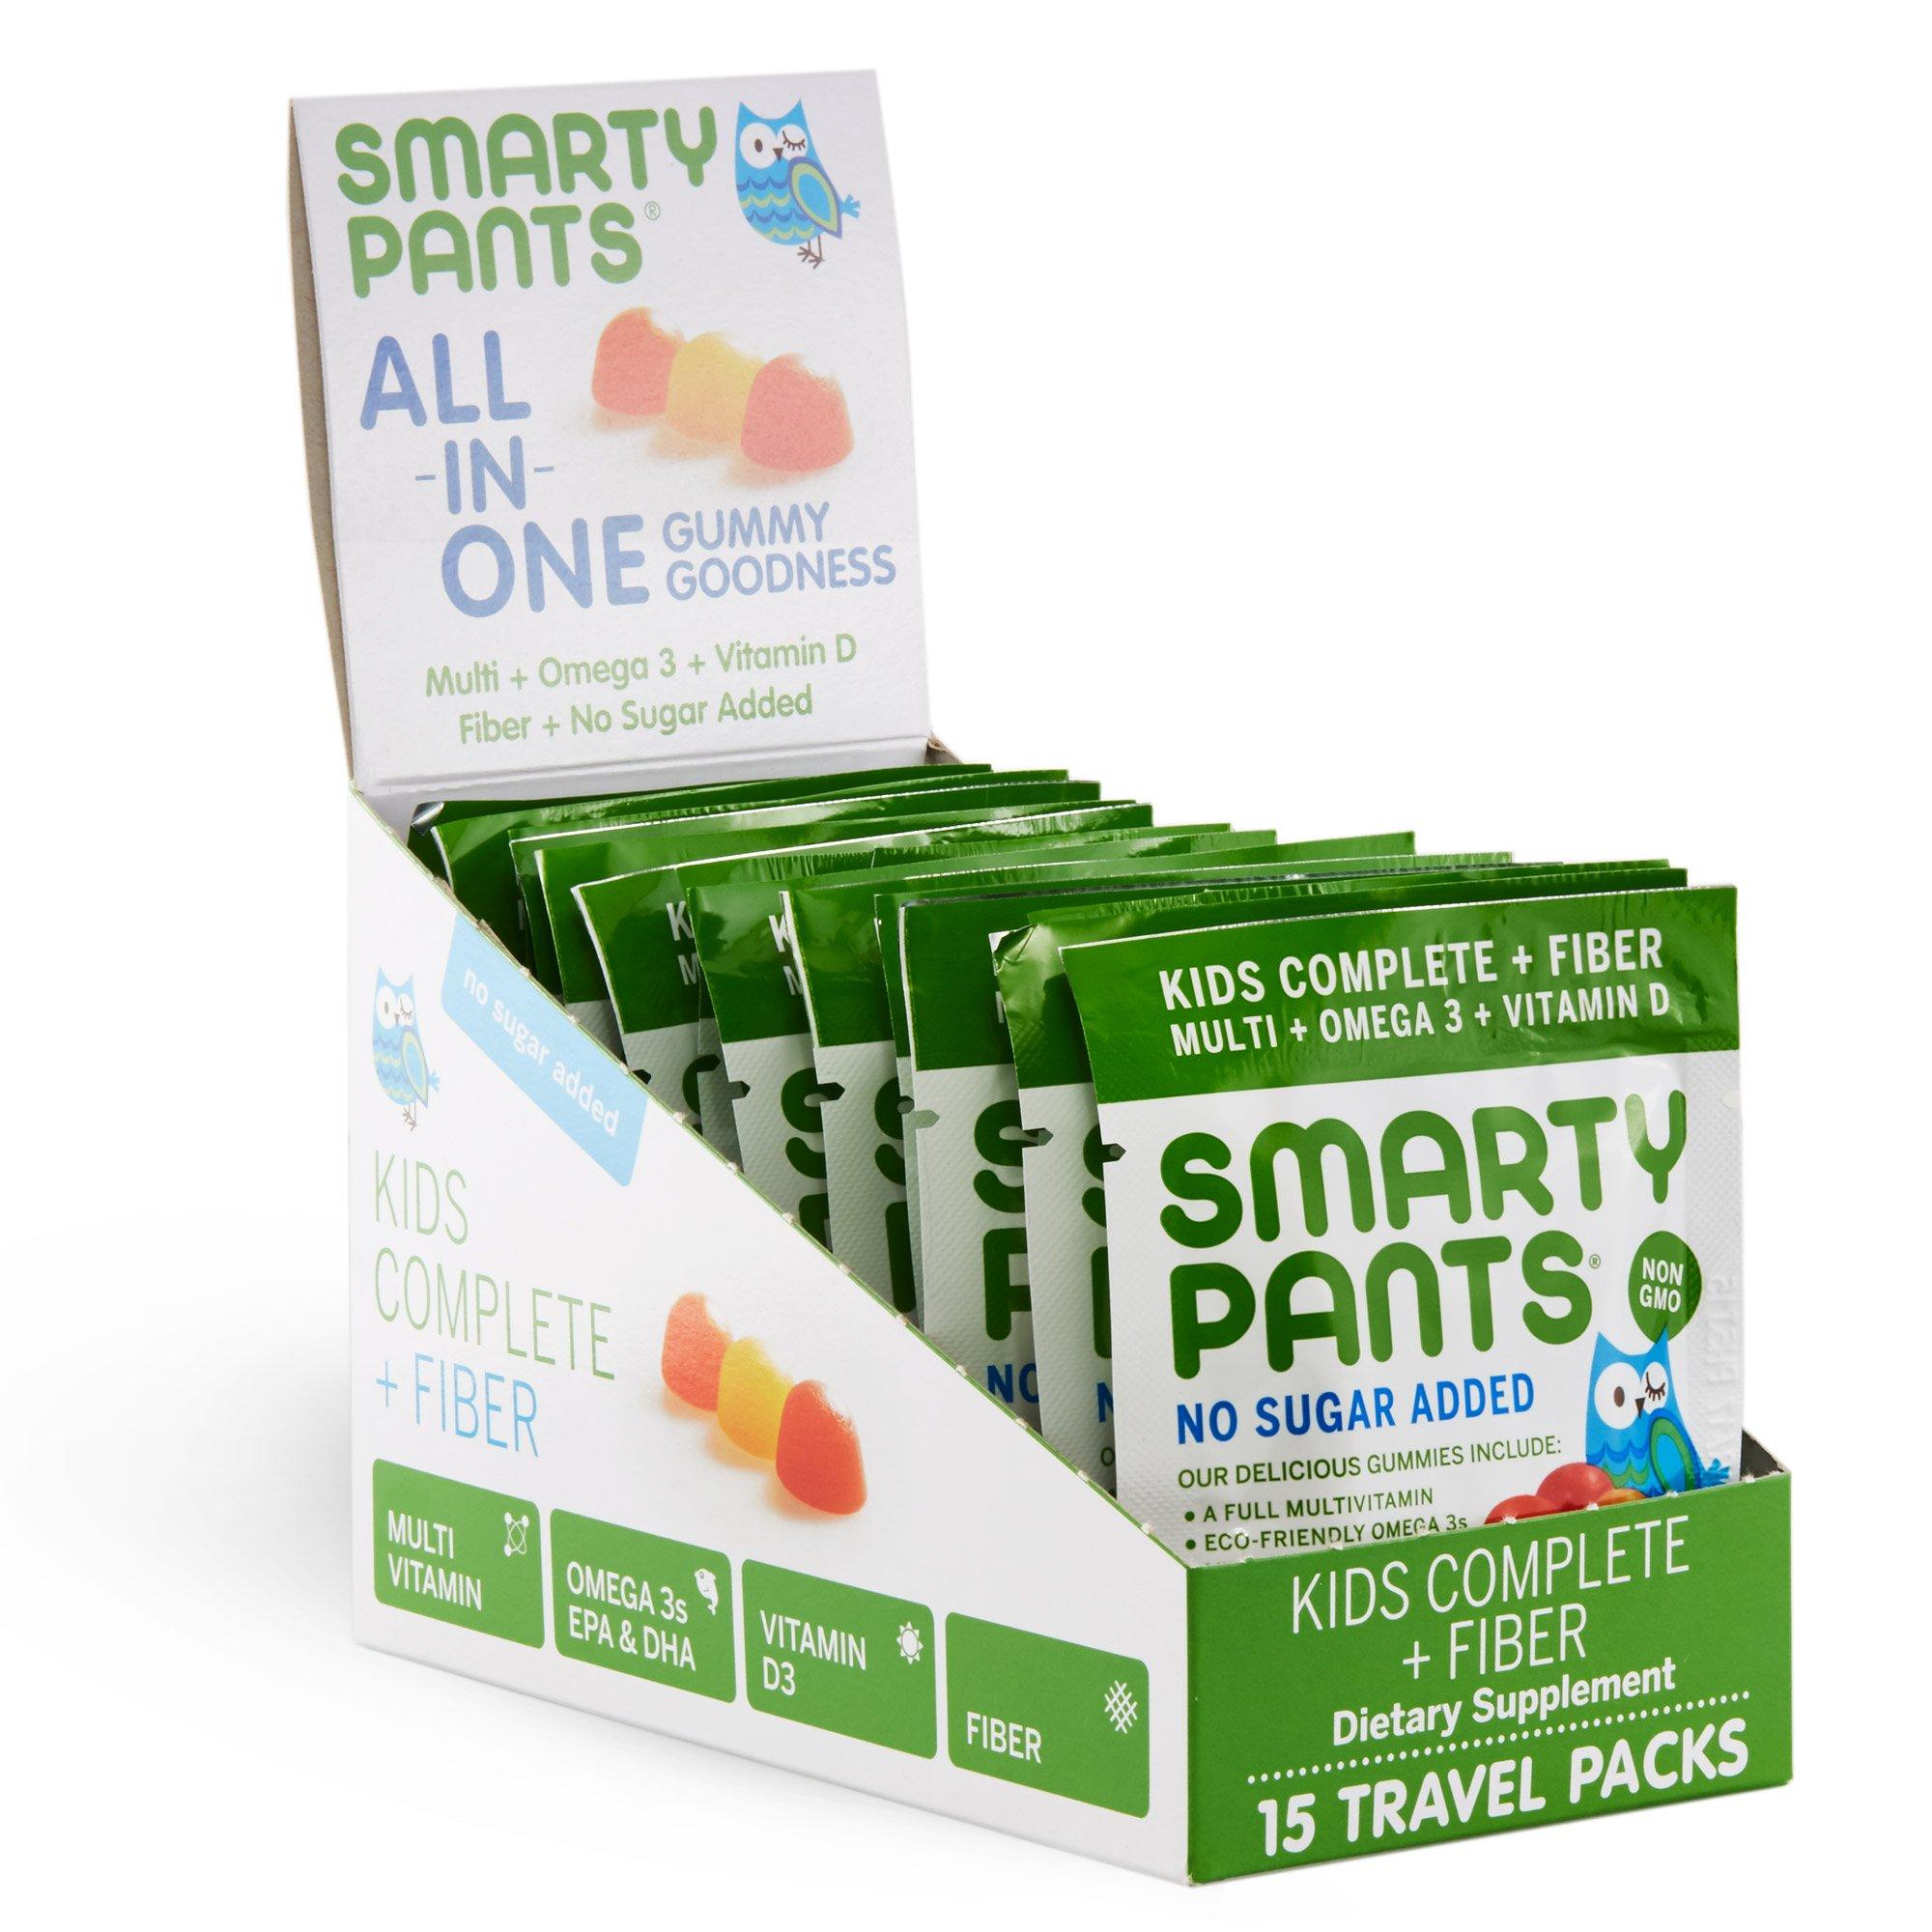 SmartyPants Kids Complete and Fiber Gummy Vitamins: Multivitamin, Gluten Free, Prebiotic Fiber, Omega 3 Fish Oil (DHA/Epa Fatty Acids), Folate (methlyfolate),Vitamin D3, 15 Count (15 Day Supply)